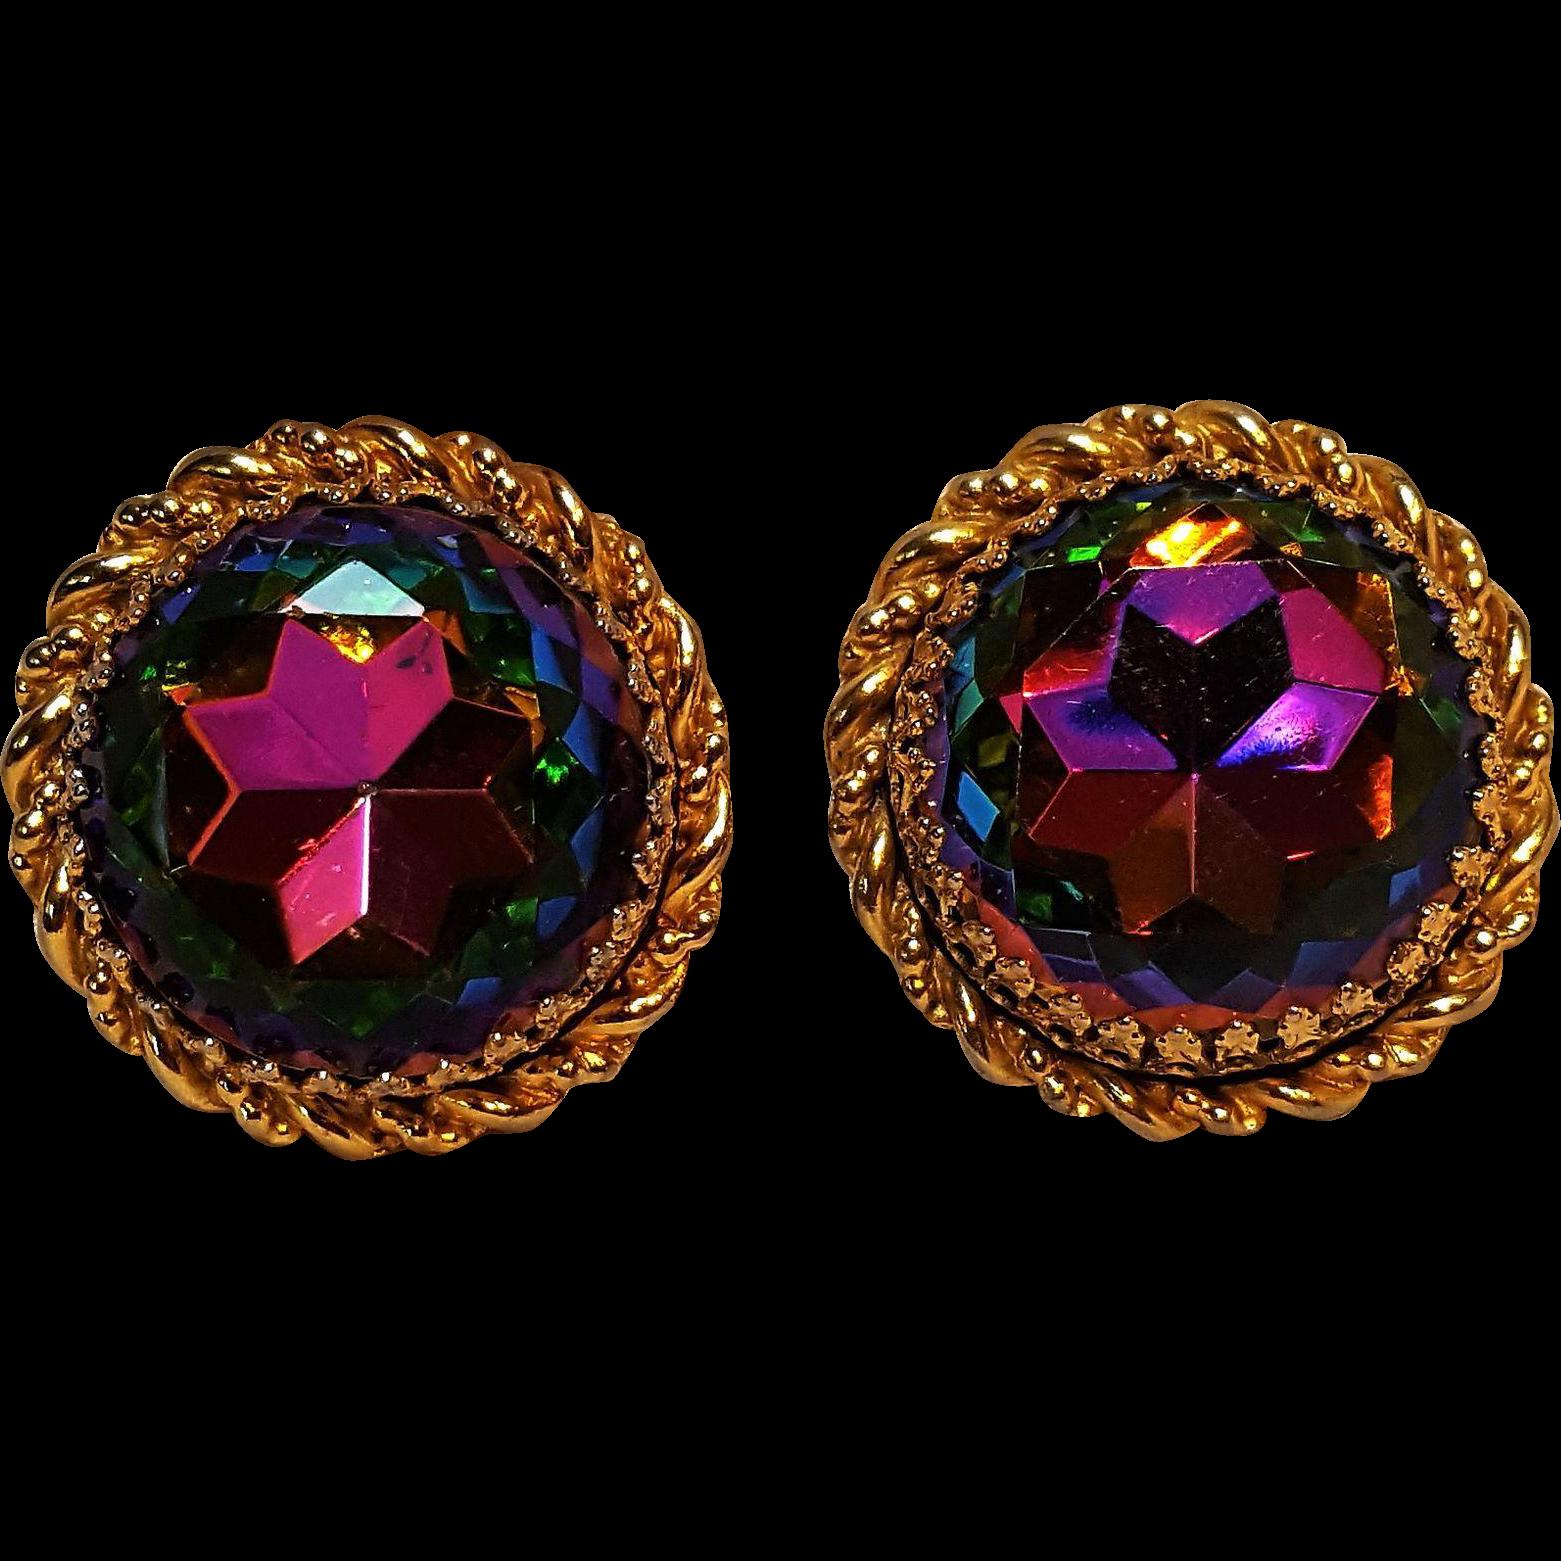 Schiaparelli watermelon rhinestone clip earrings